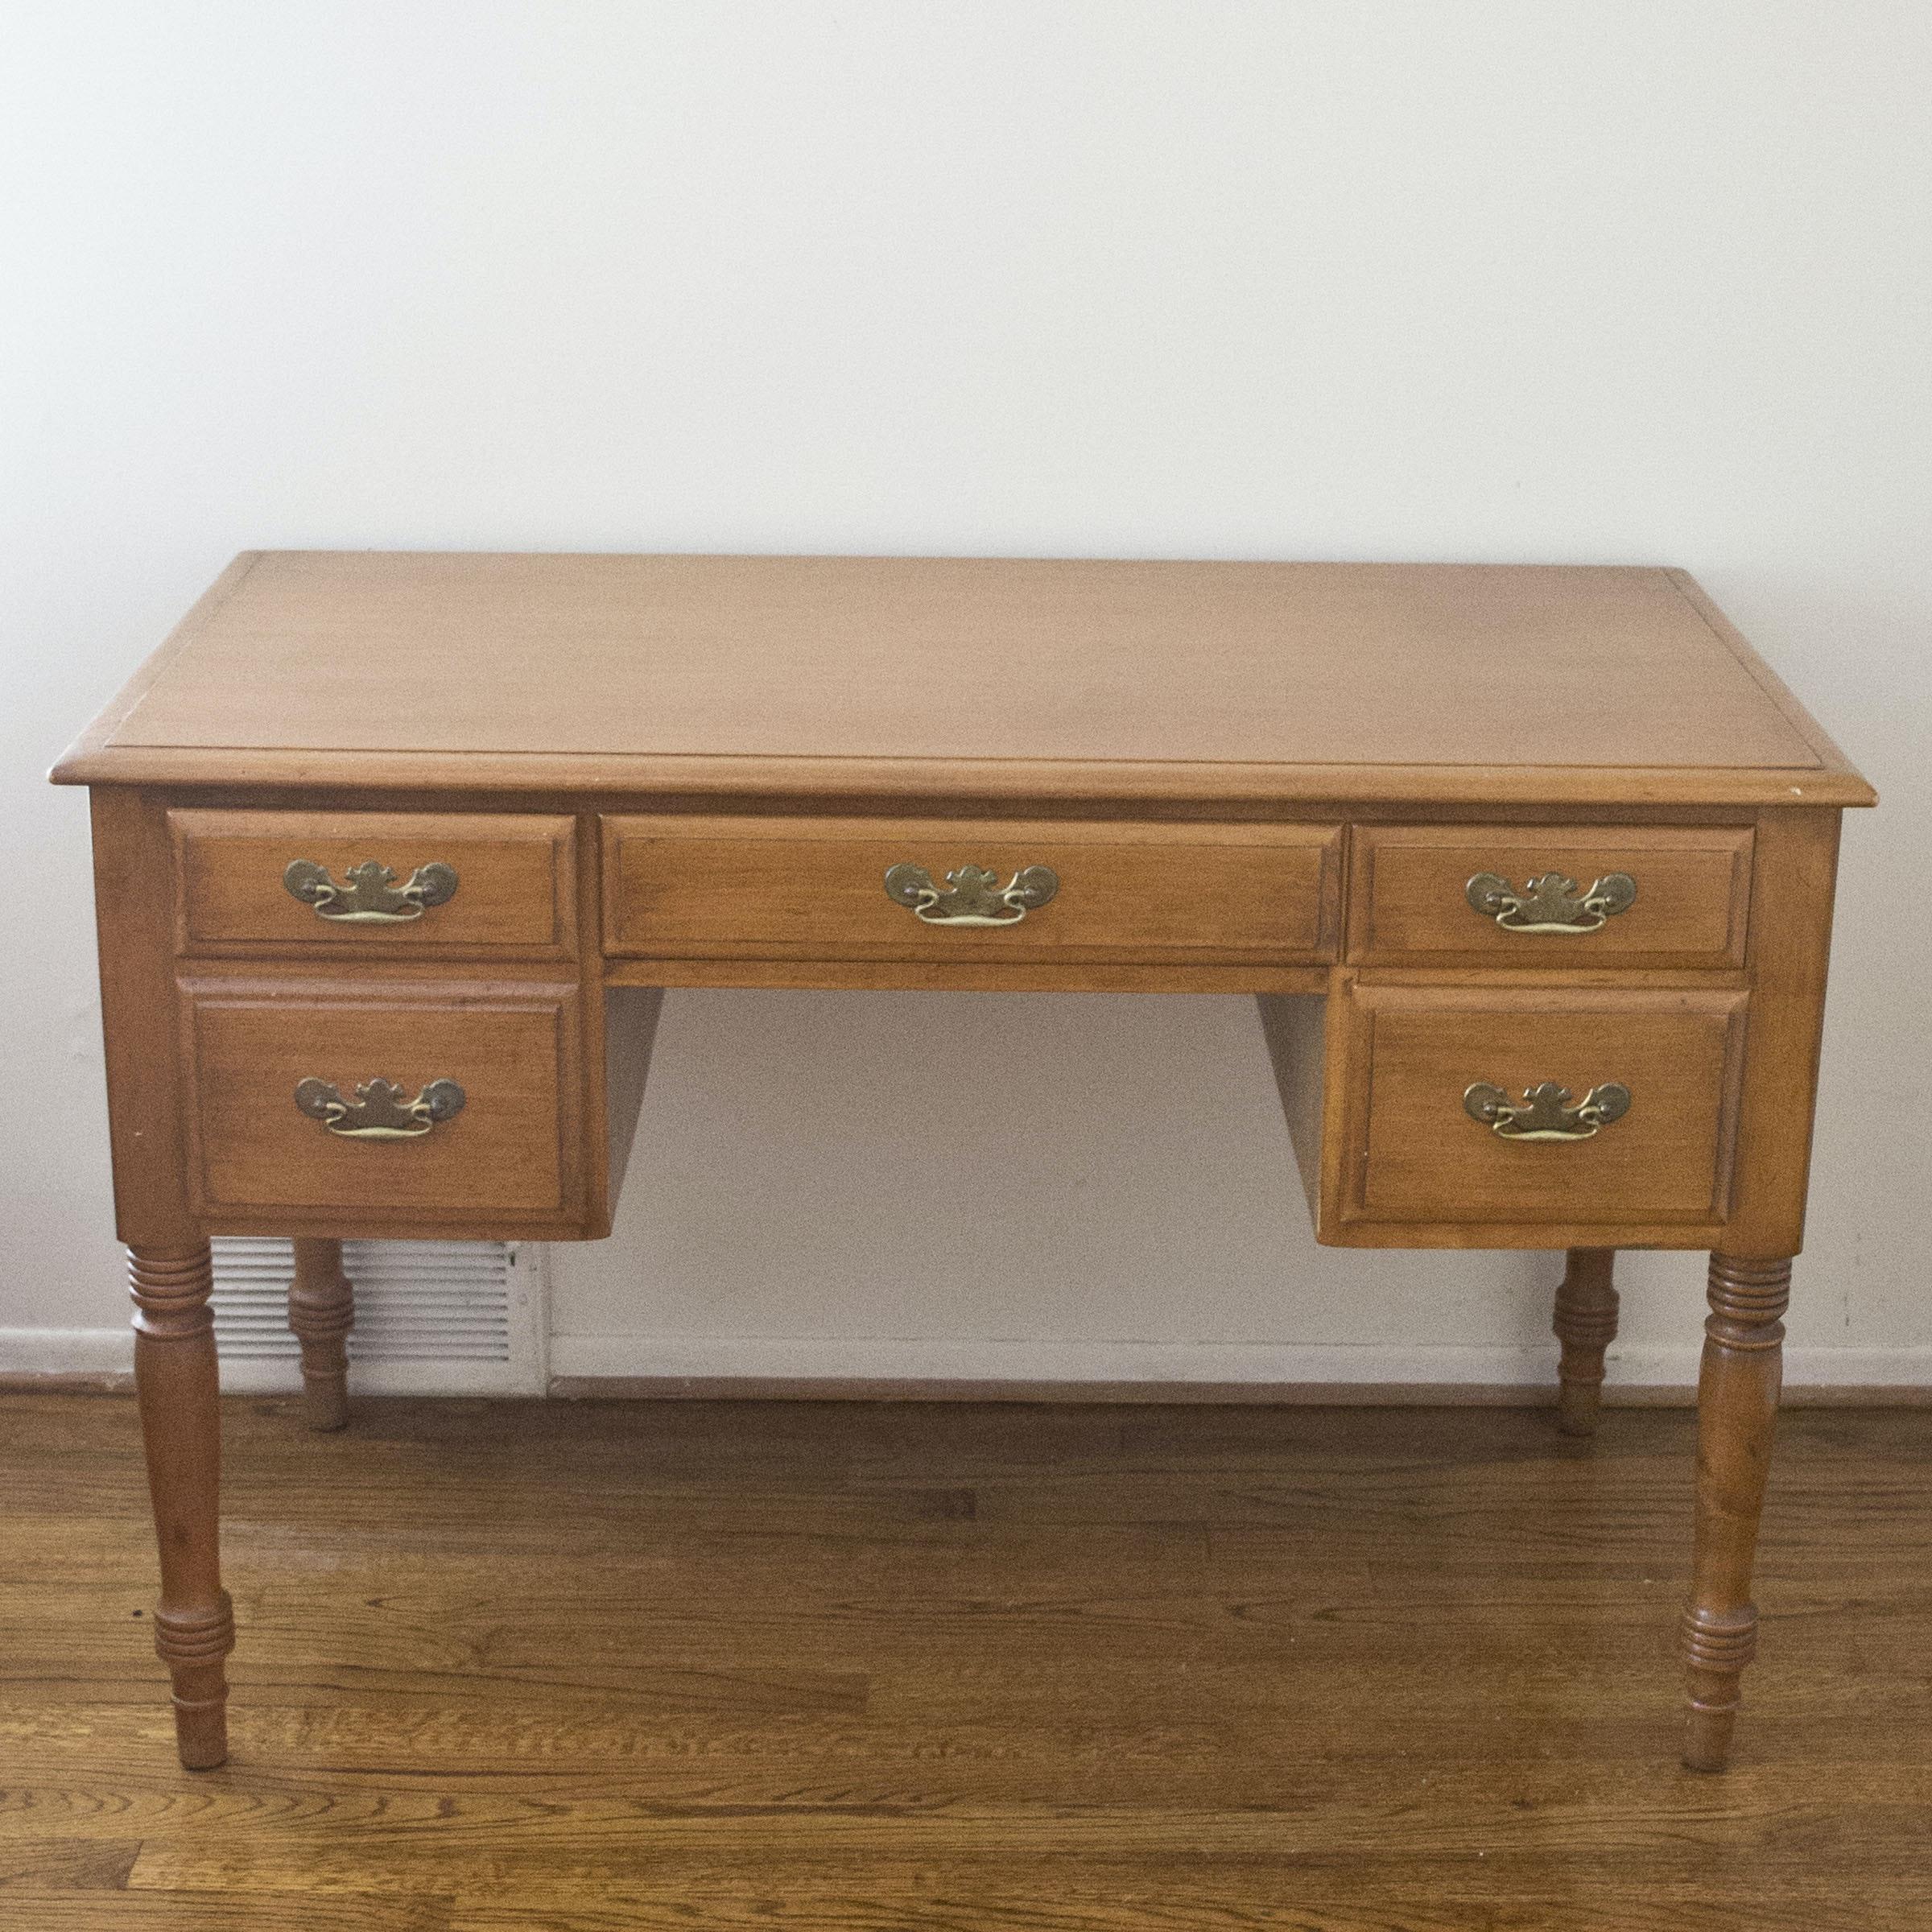 """No. 12 Ancestor"" Reproduction Maple Desk by Conant Ball"